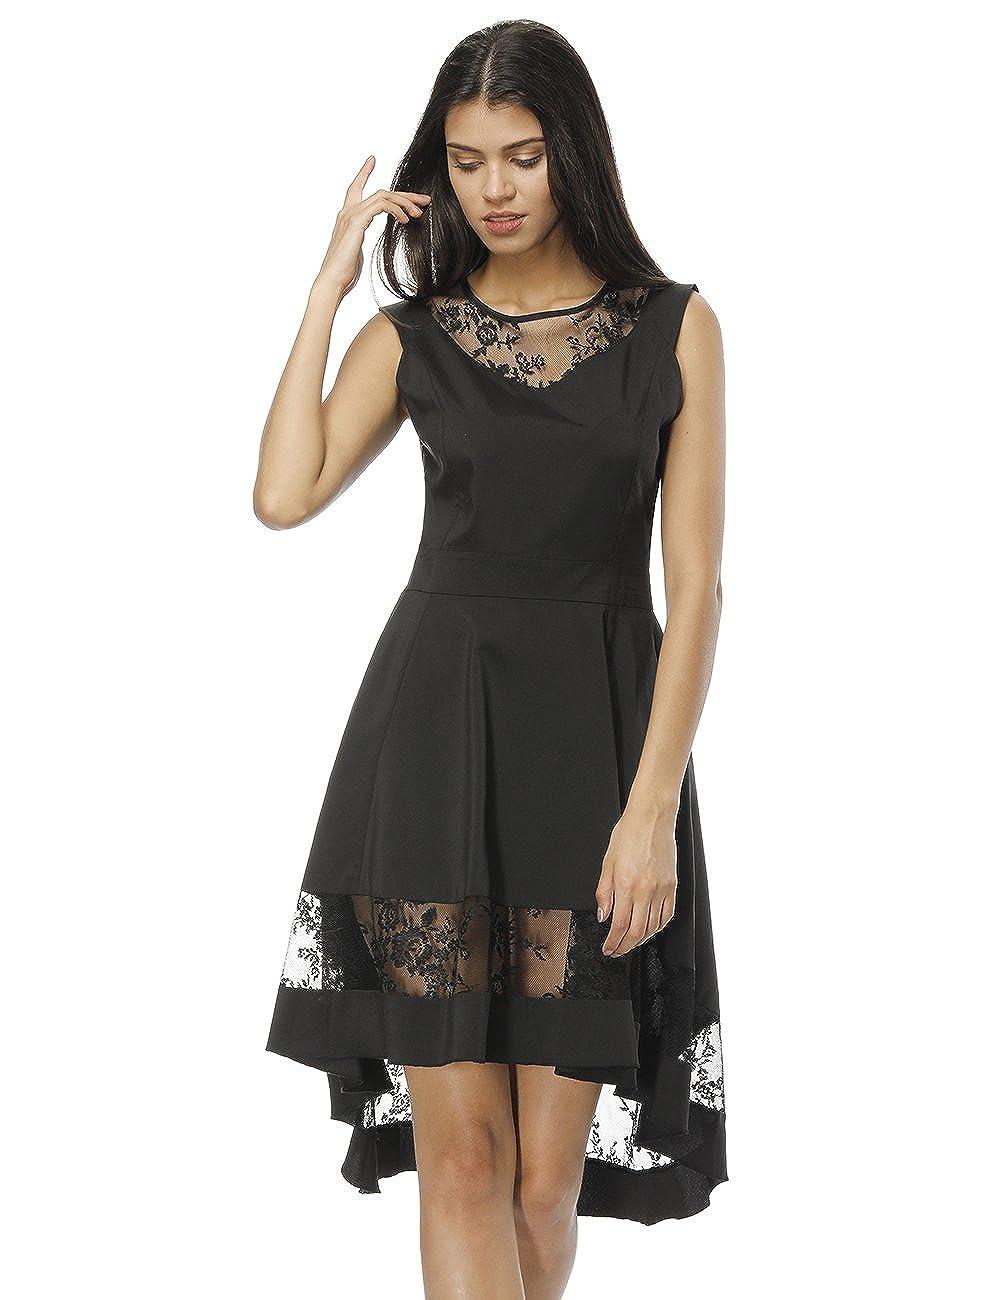 9dfce3e0b32 Top 10 wholesale High Waist Lace Dress - Chinabrands.com